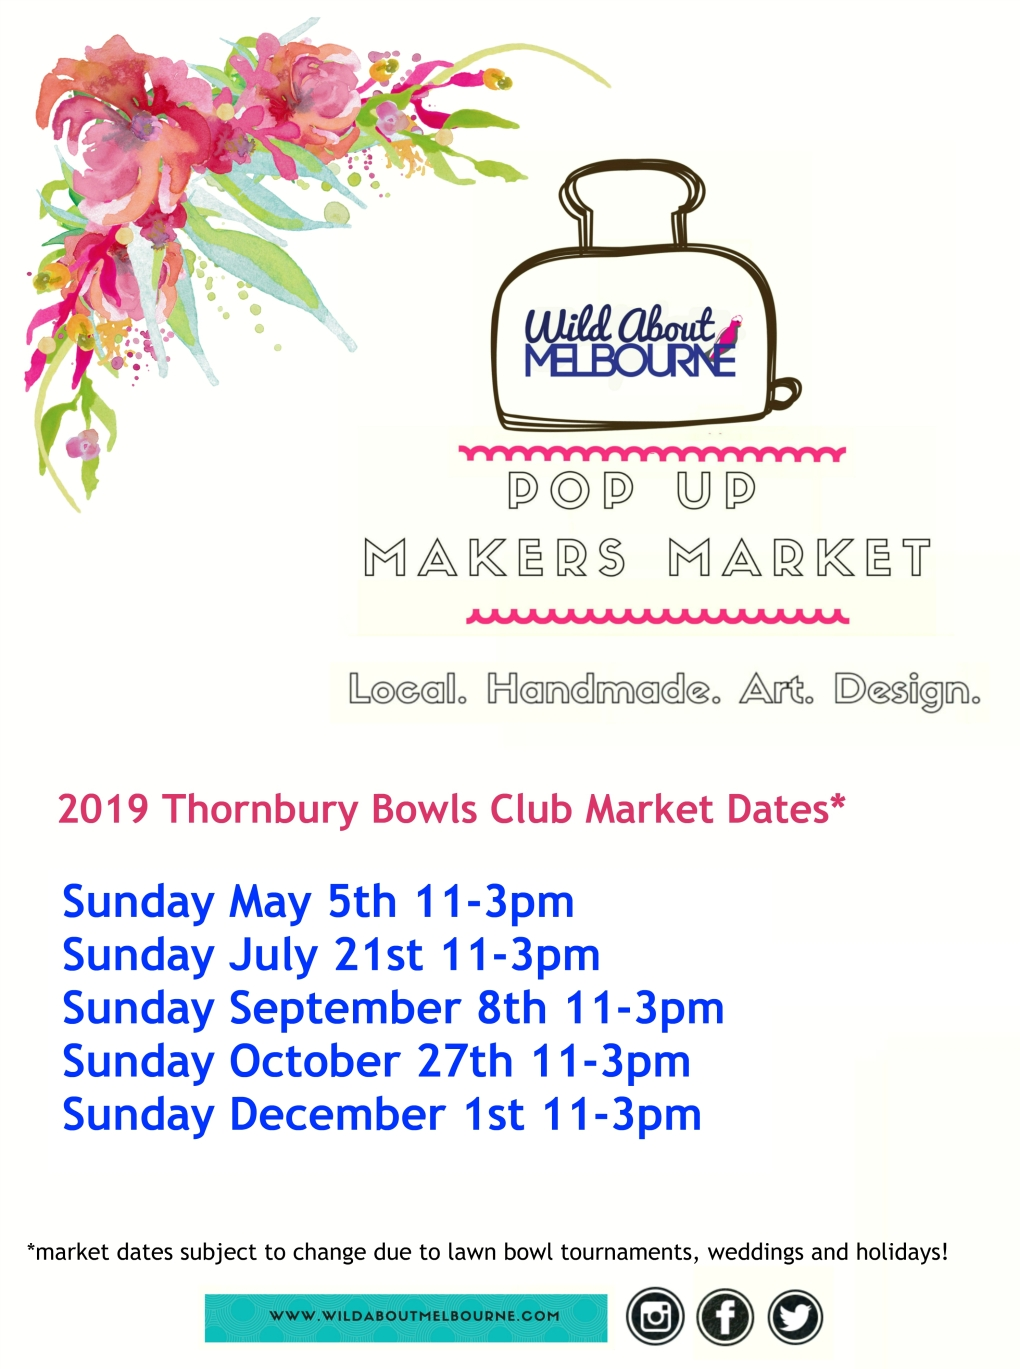 2019 Market Dates